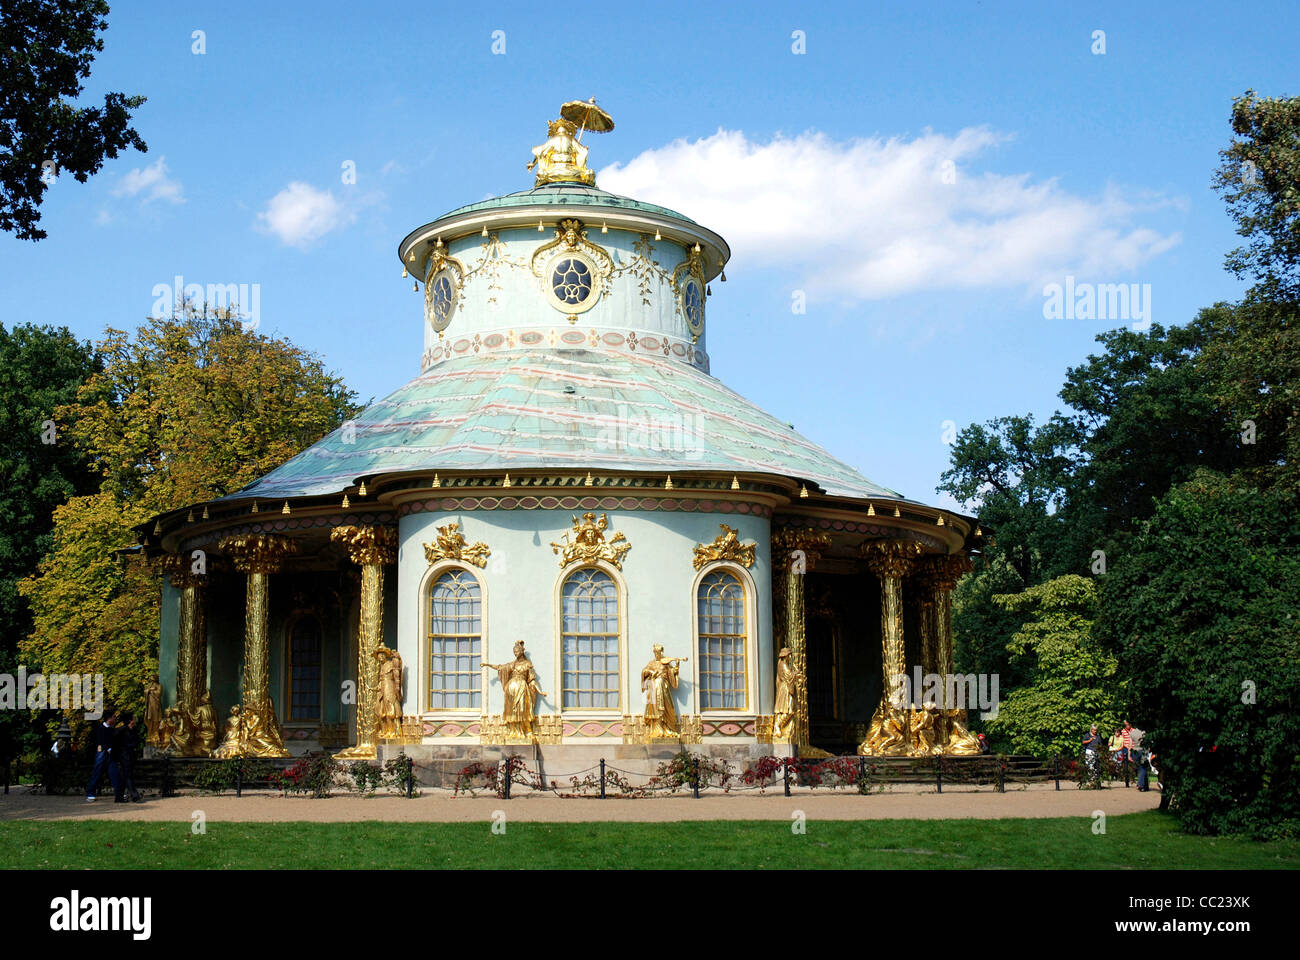 Chinese tea house of Sanssouci in Potsdam. - Stock Image